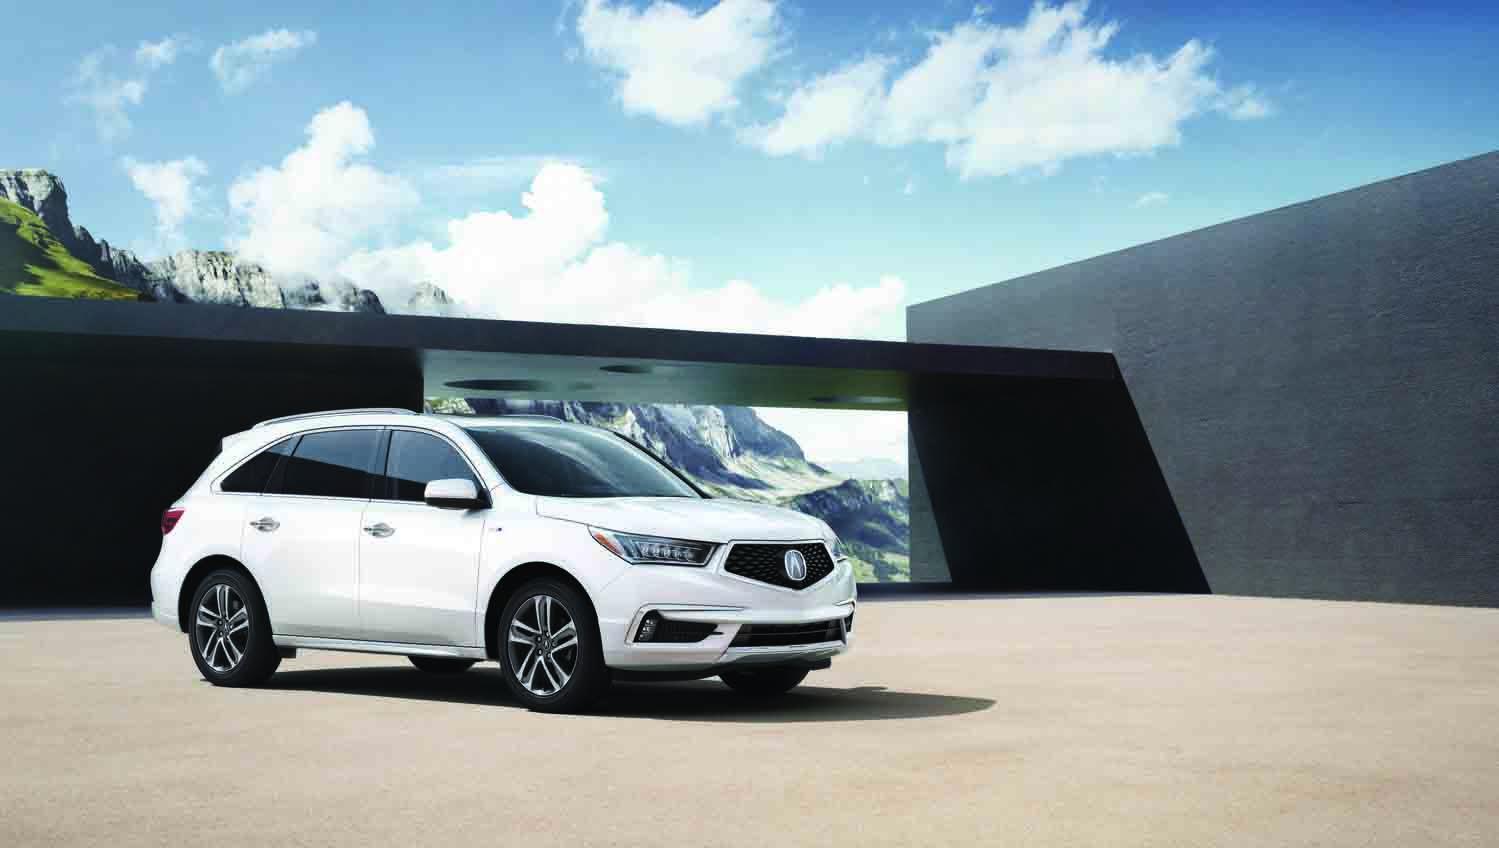 PreOwned Acura Dealer Evans GA Acura Of Augusta - Used acura dealership